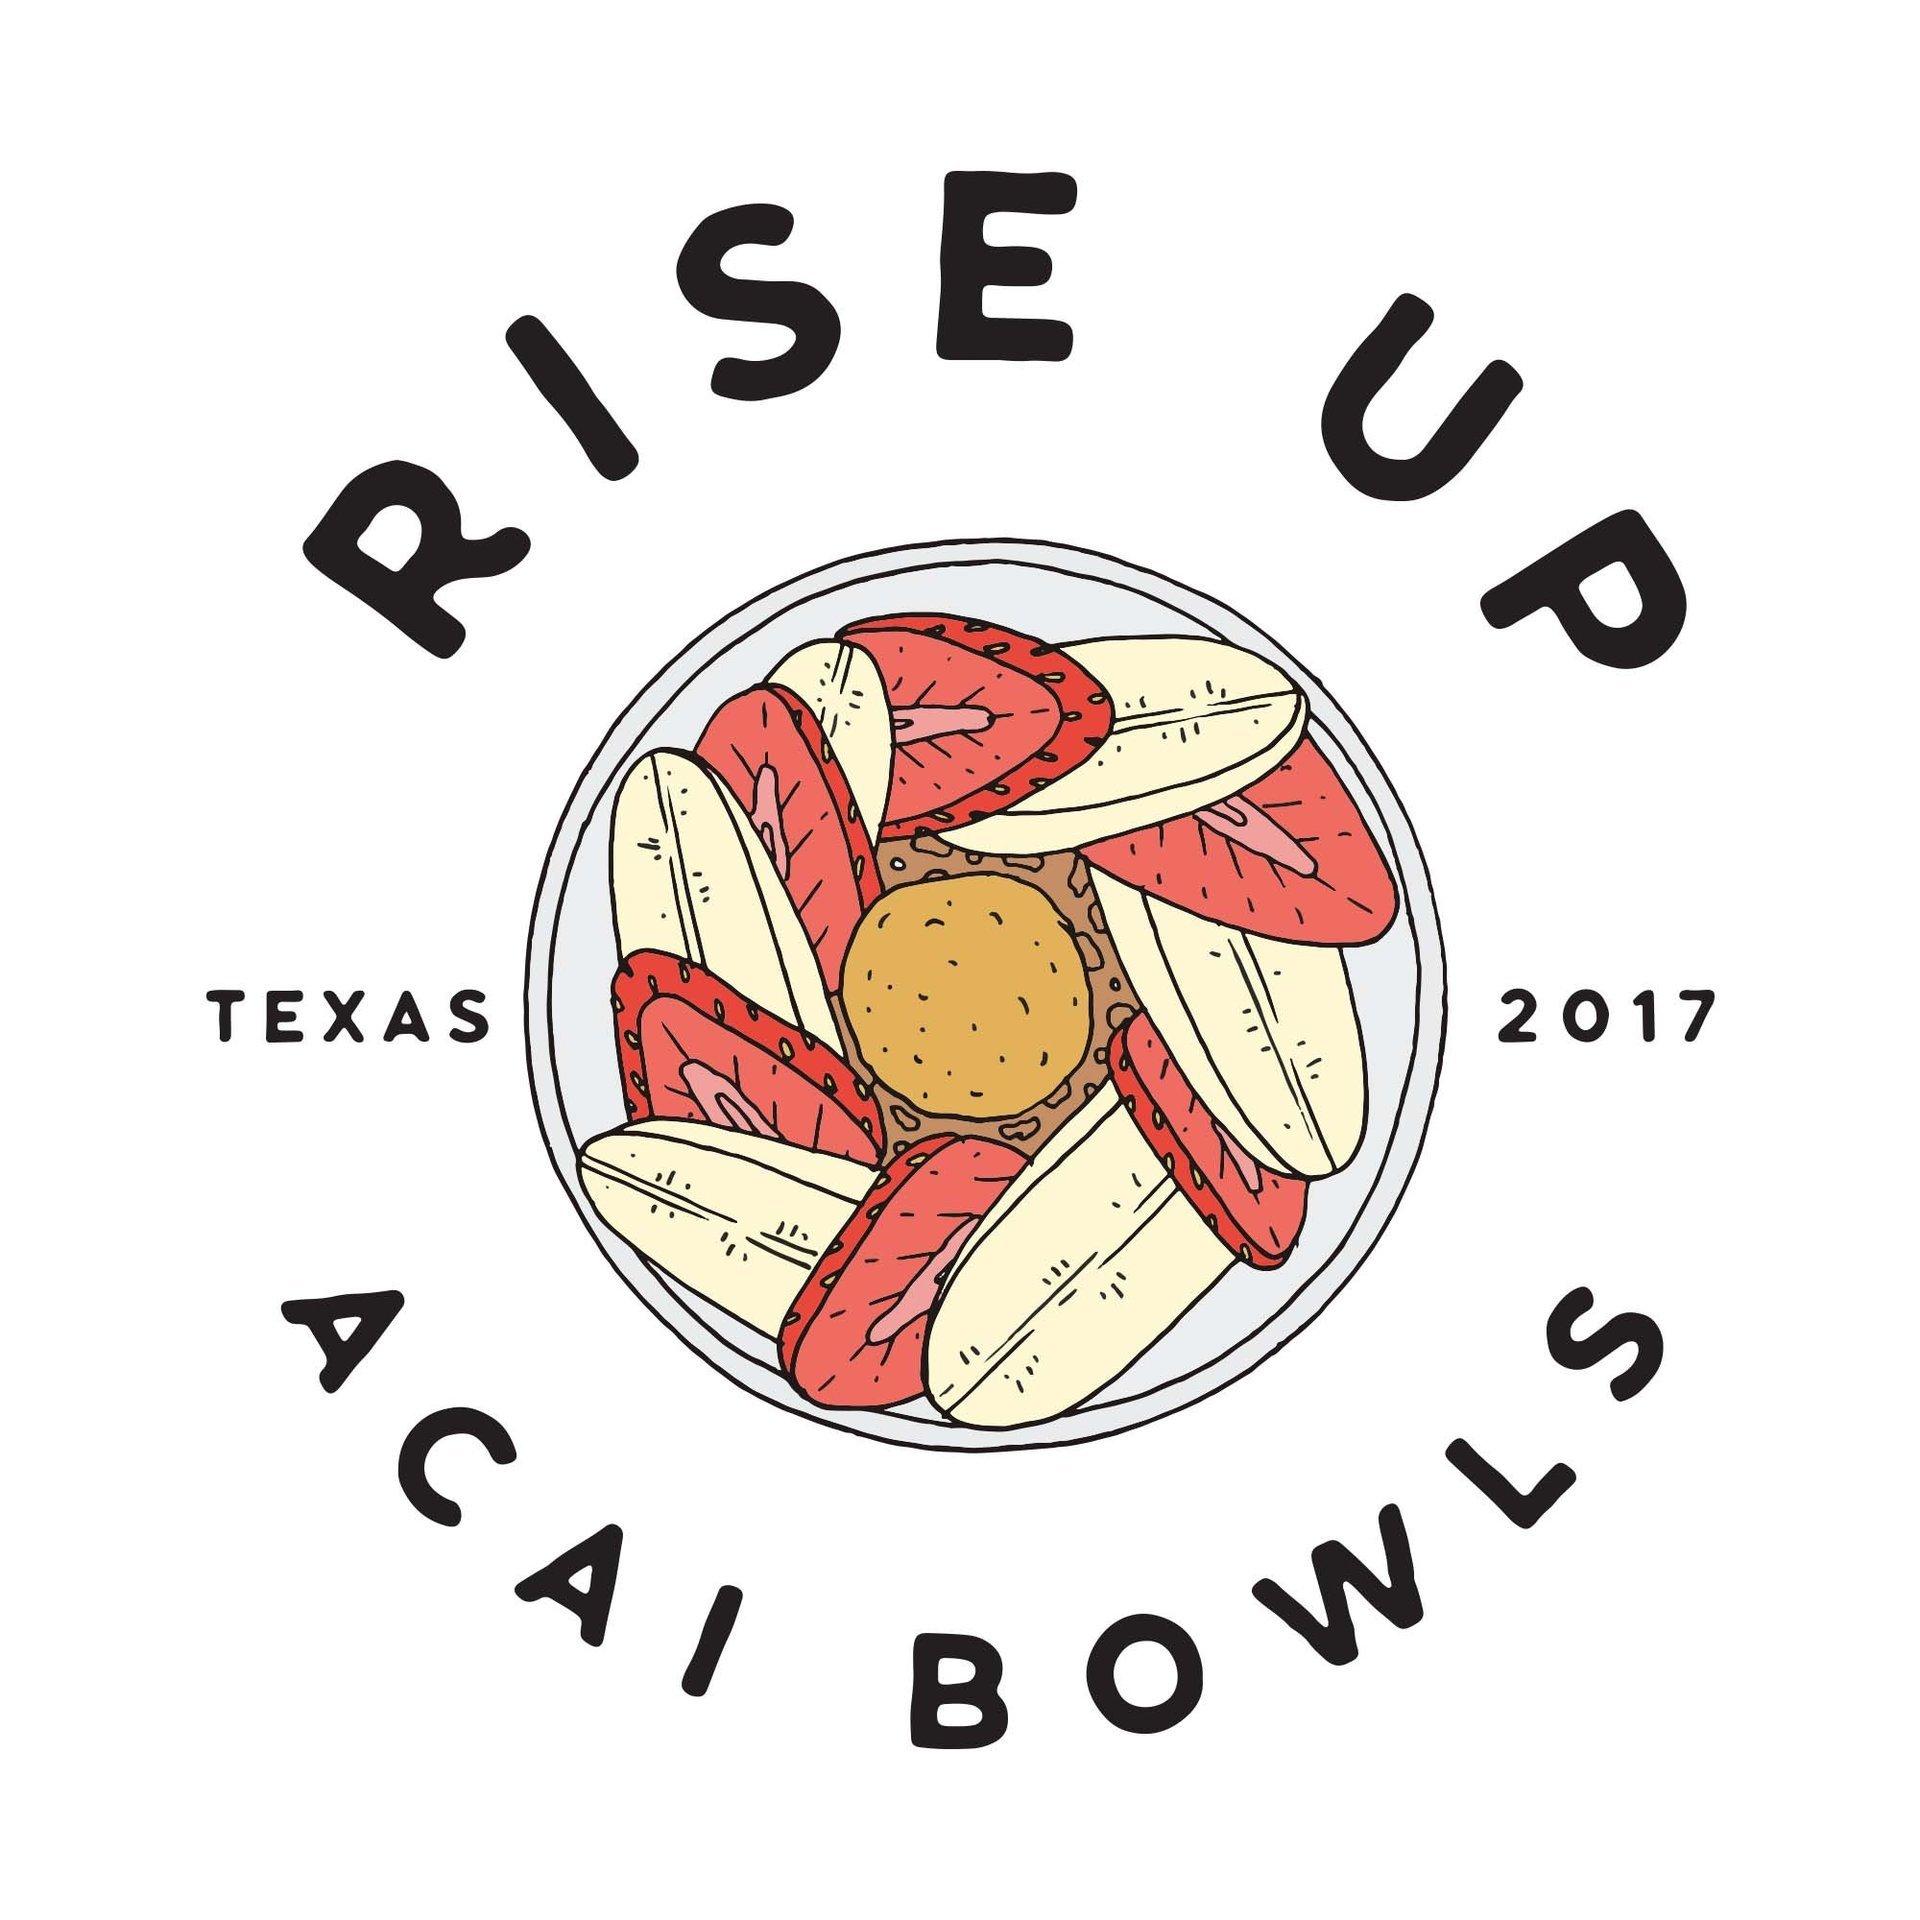 Acai Bowls San Antonio, TX